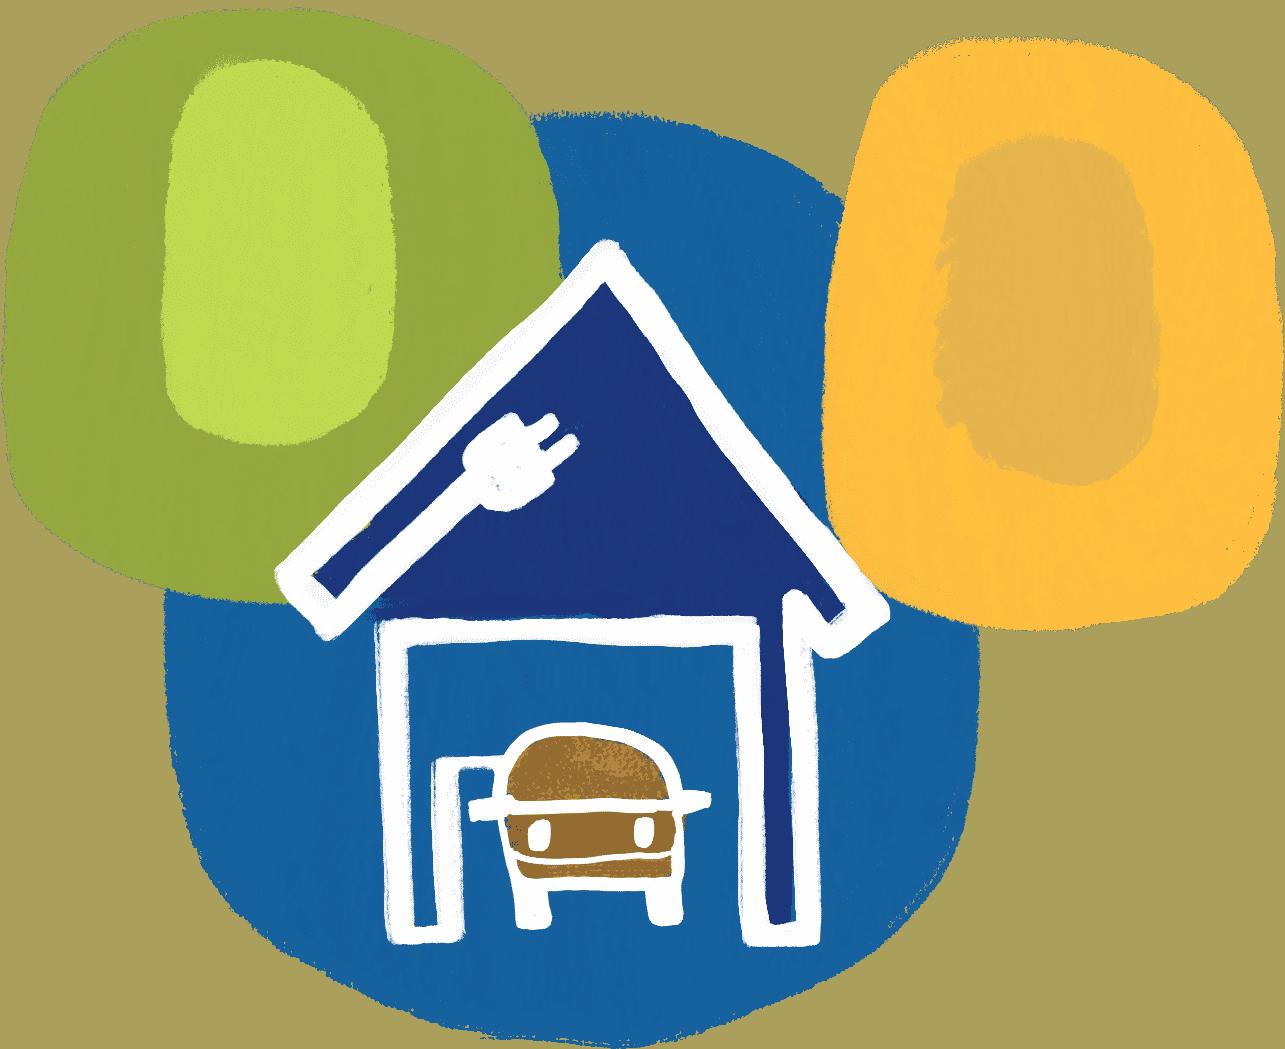 At-home charging illustration